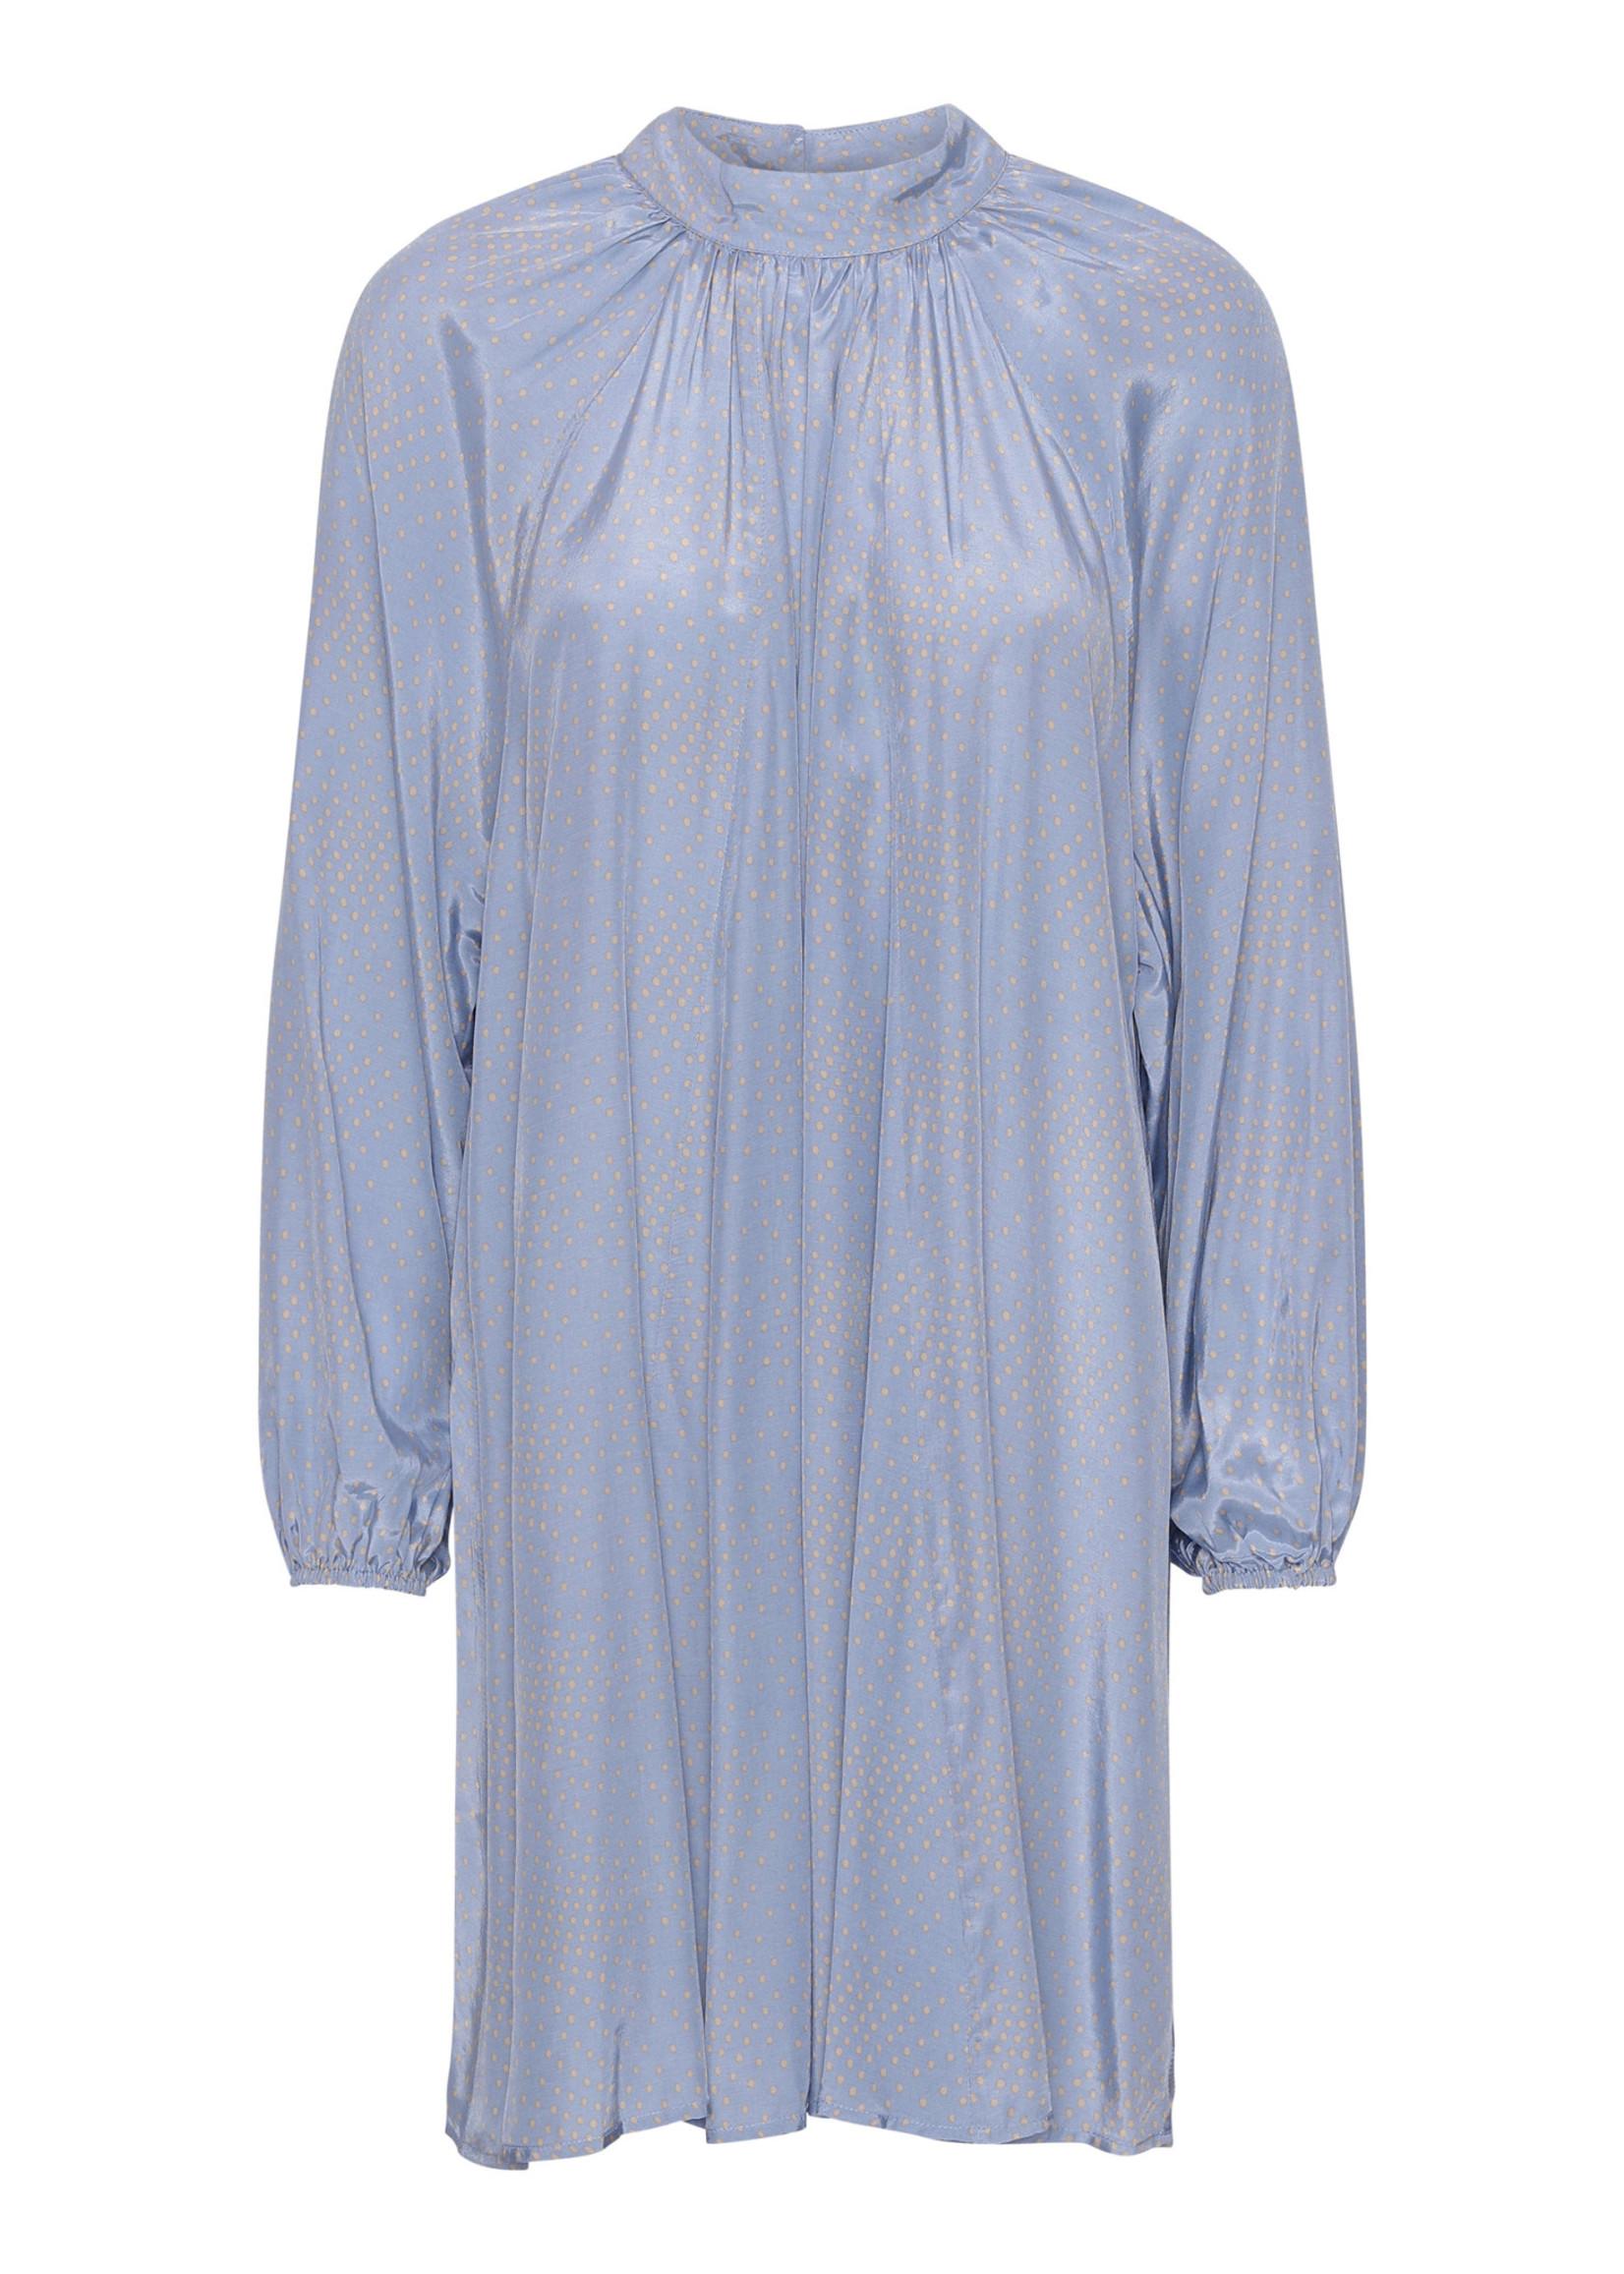 COSTAMANI Cirkeline dress blue - laatste maat L